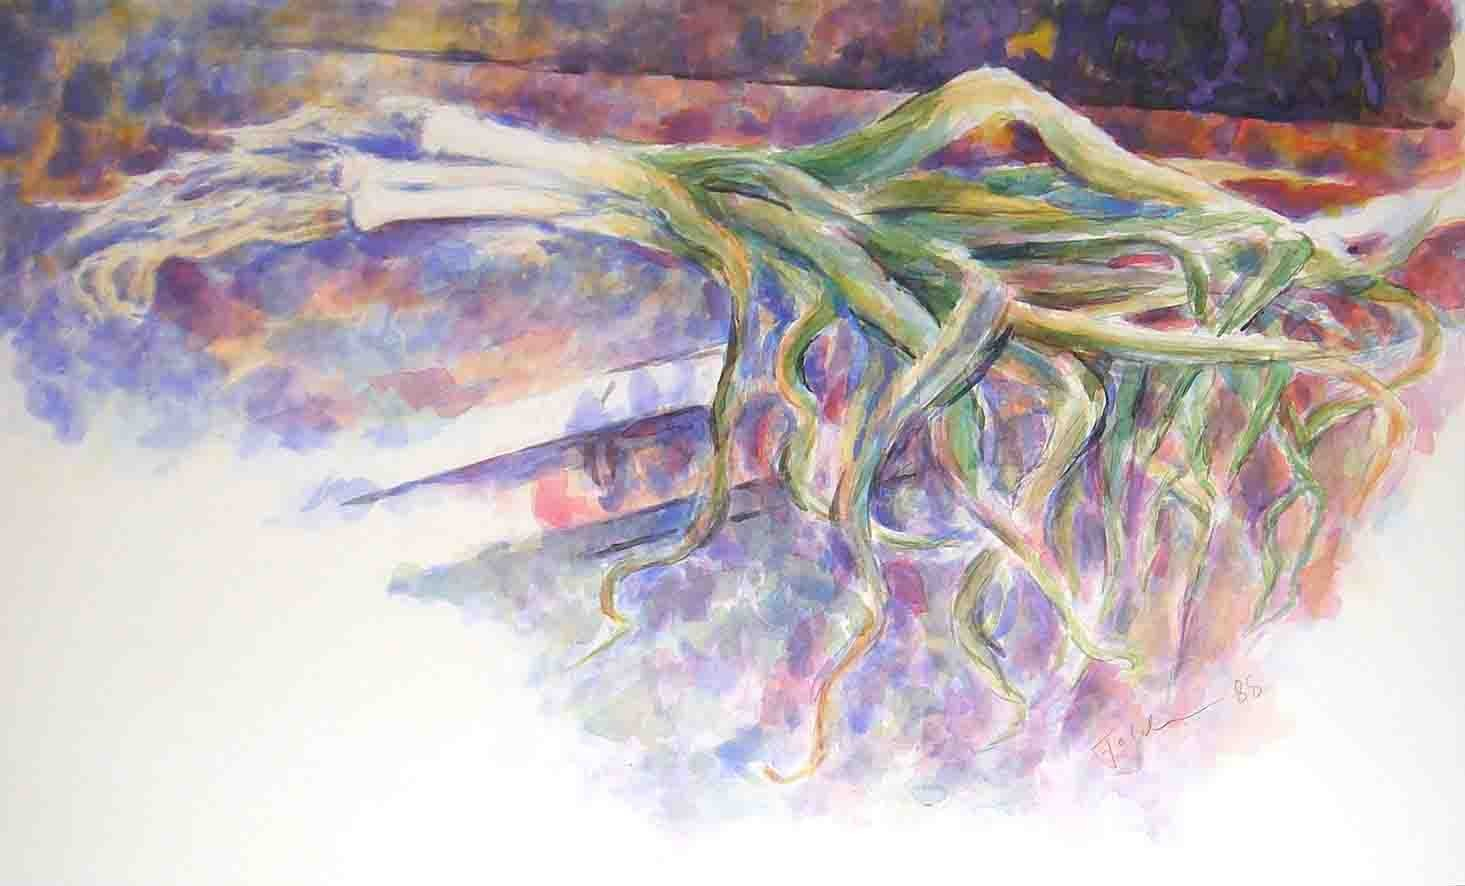 LAUCH, Aquarell, 41x61cm